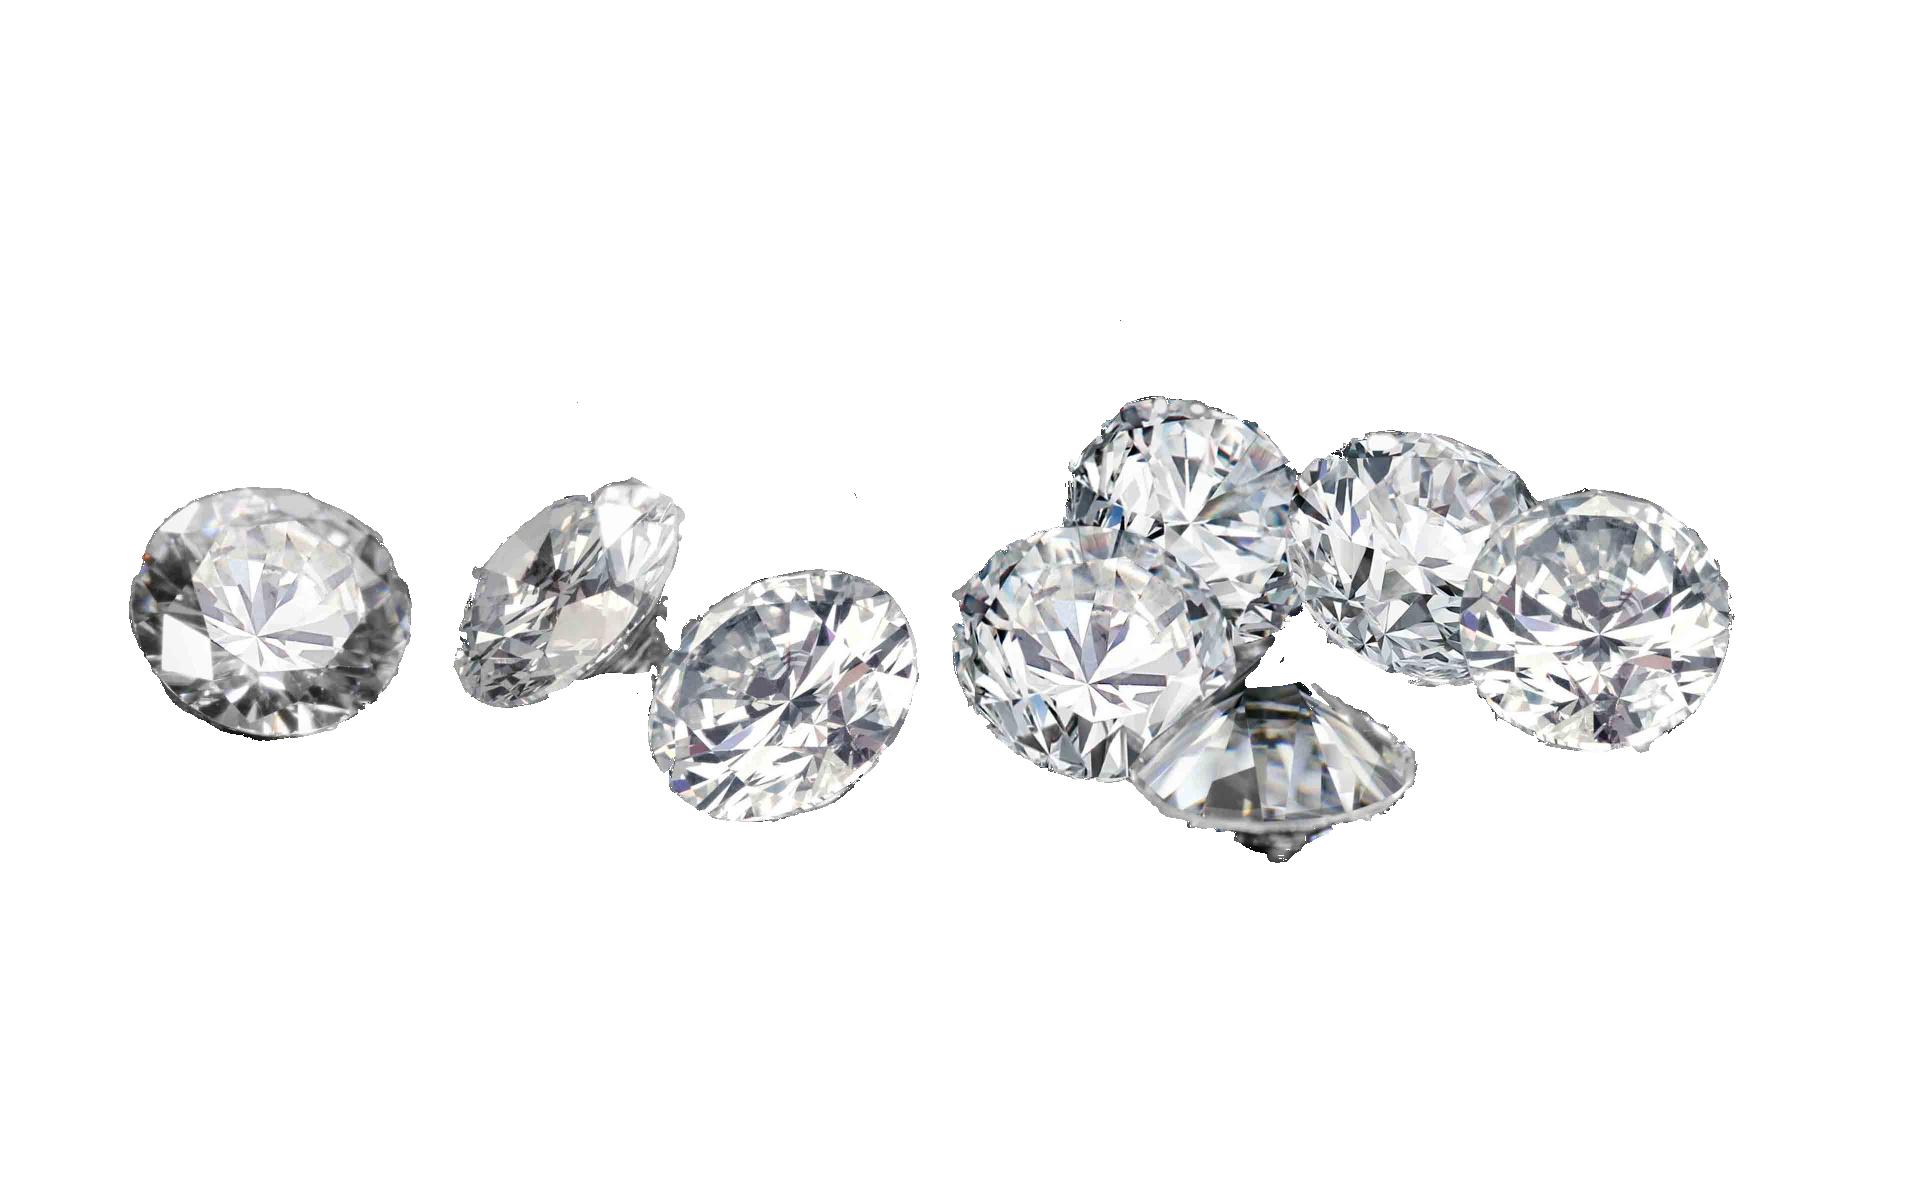 Png transparent images free. Clipart diamond pile diamond